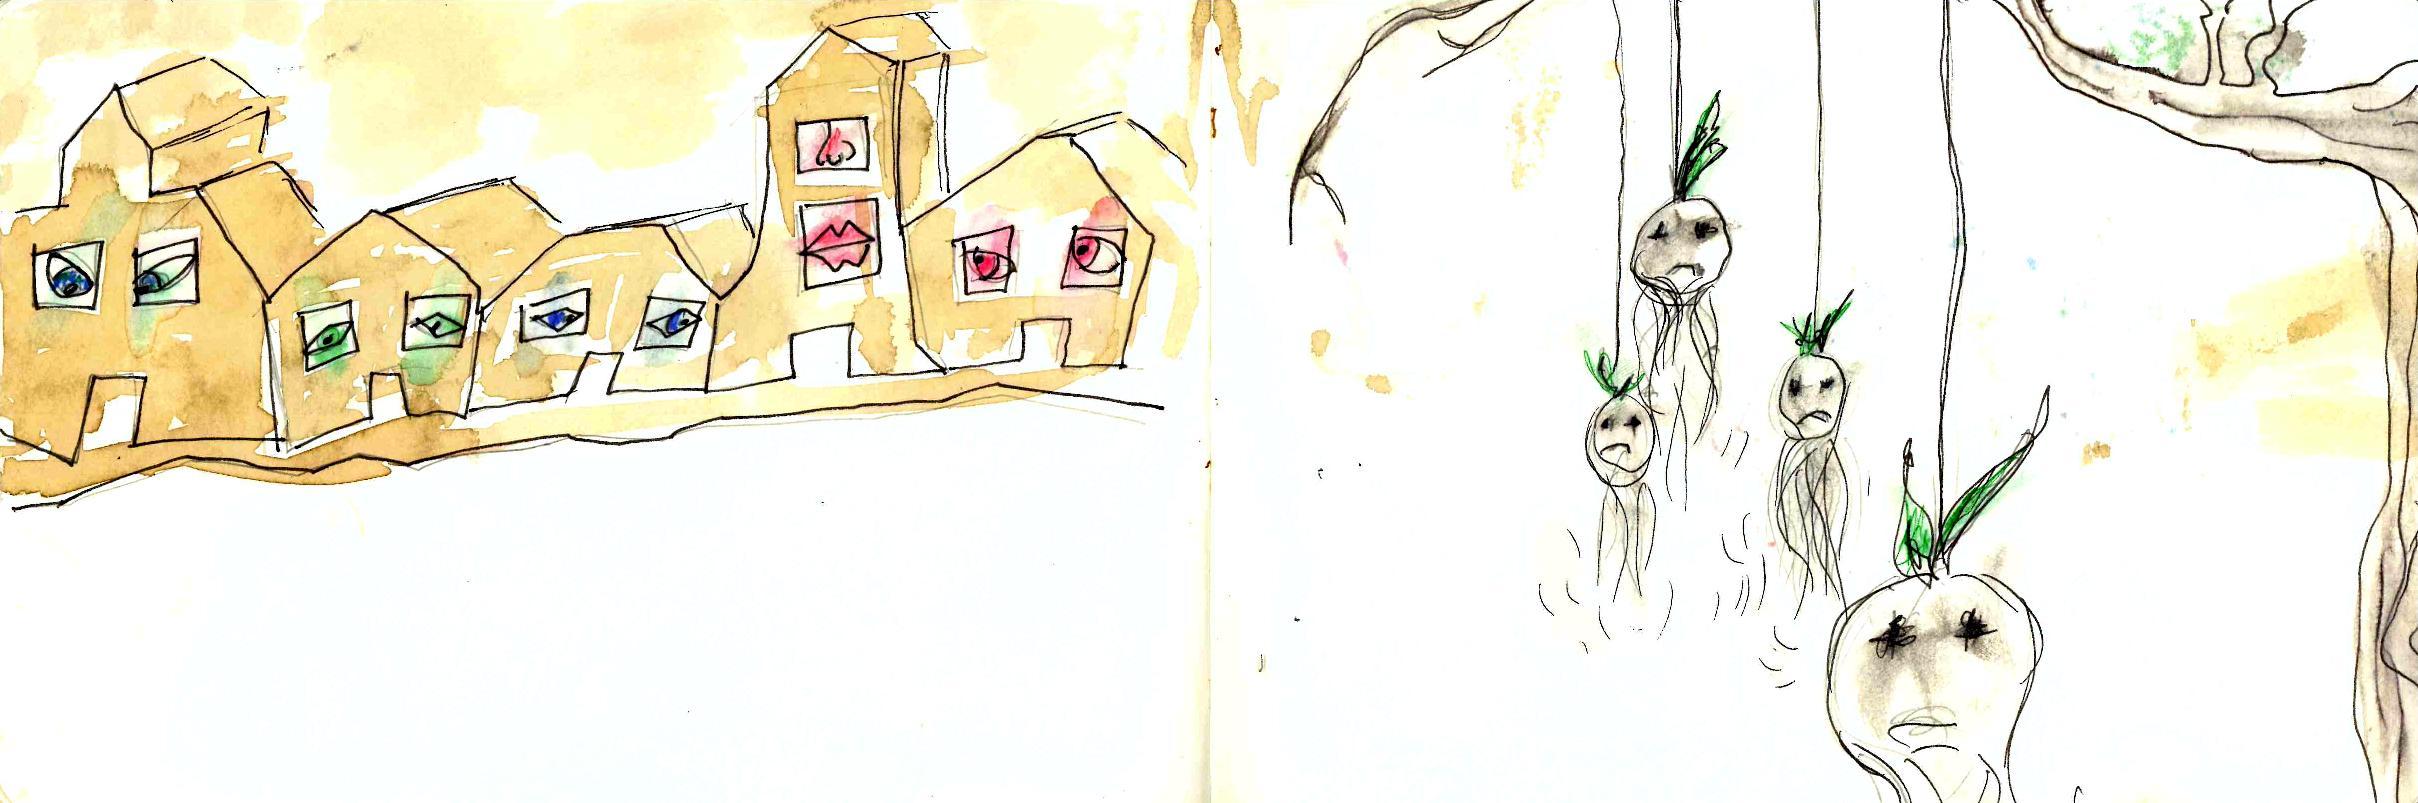 Croquis Lumrottes3-page-001